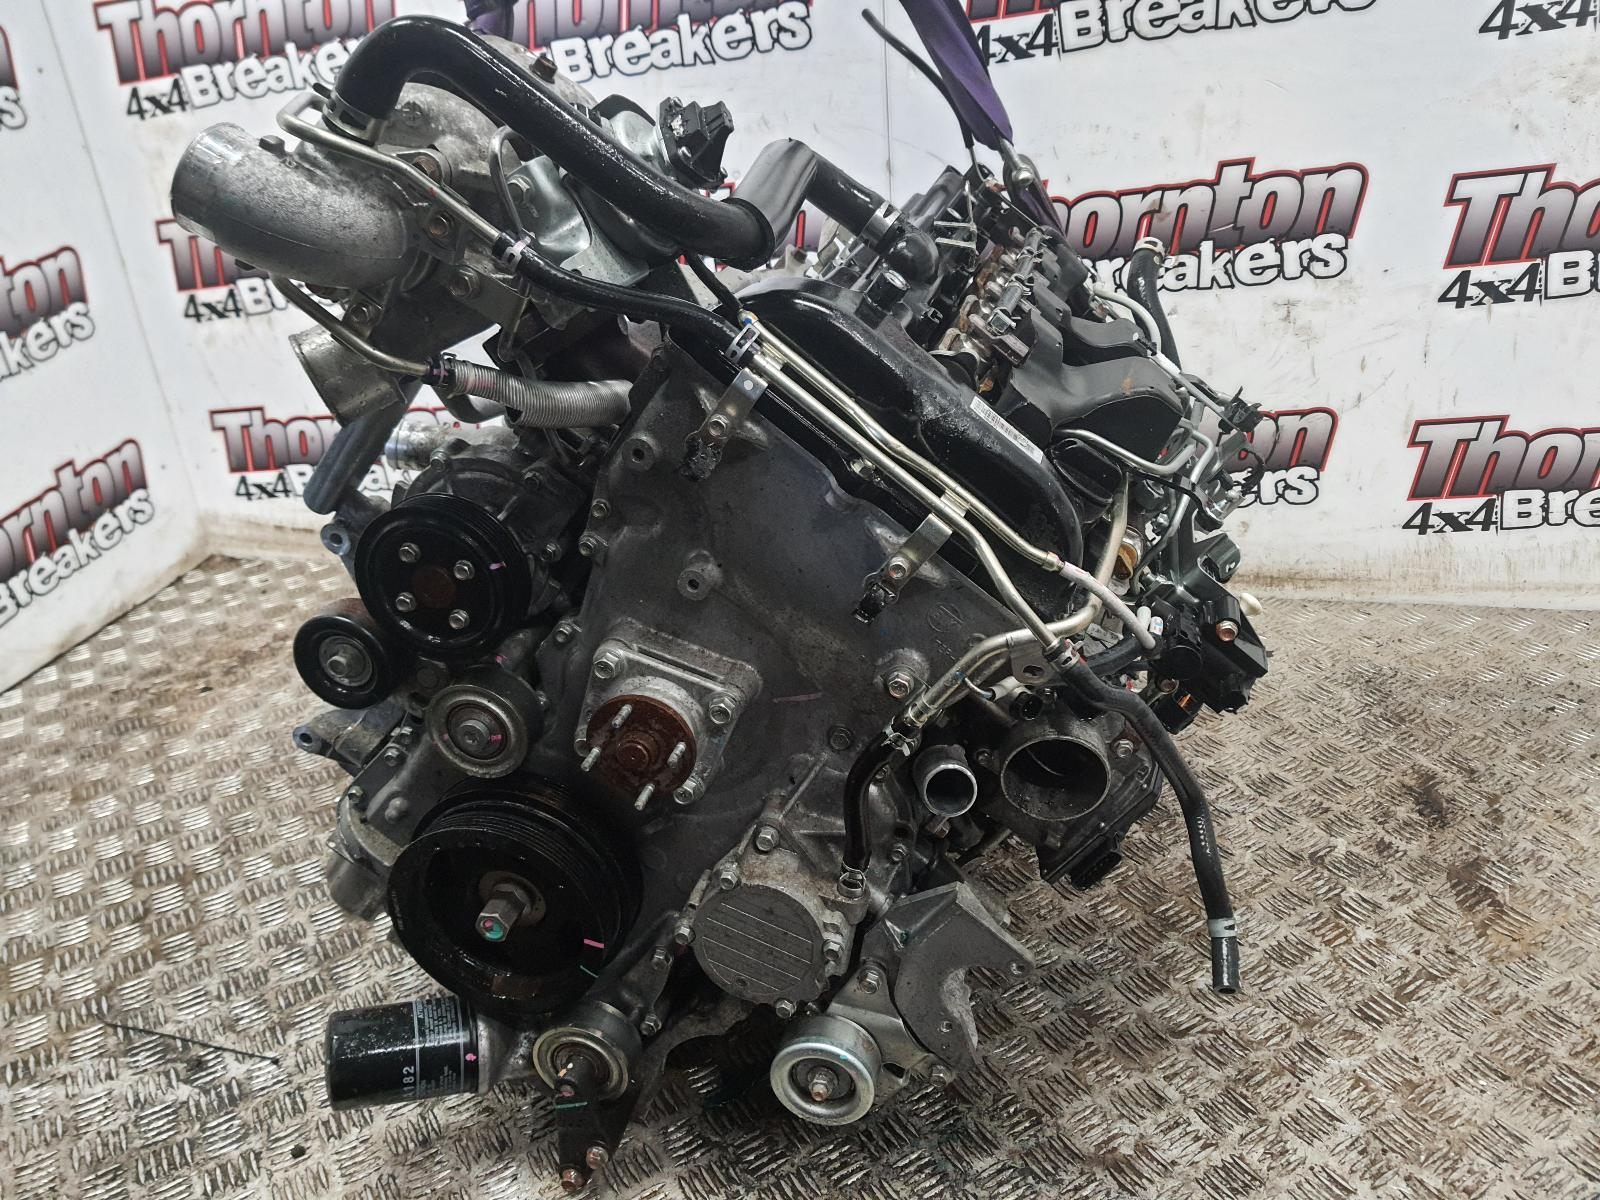 Image for a 2017 FIAT FULLBACK 2.4 Diesel 4N16 Engine